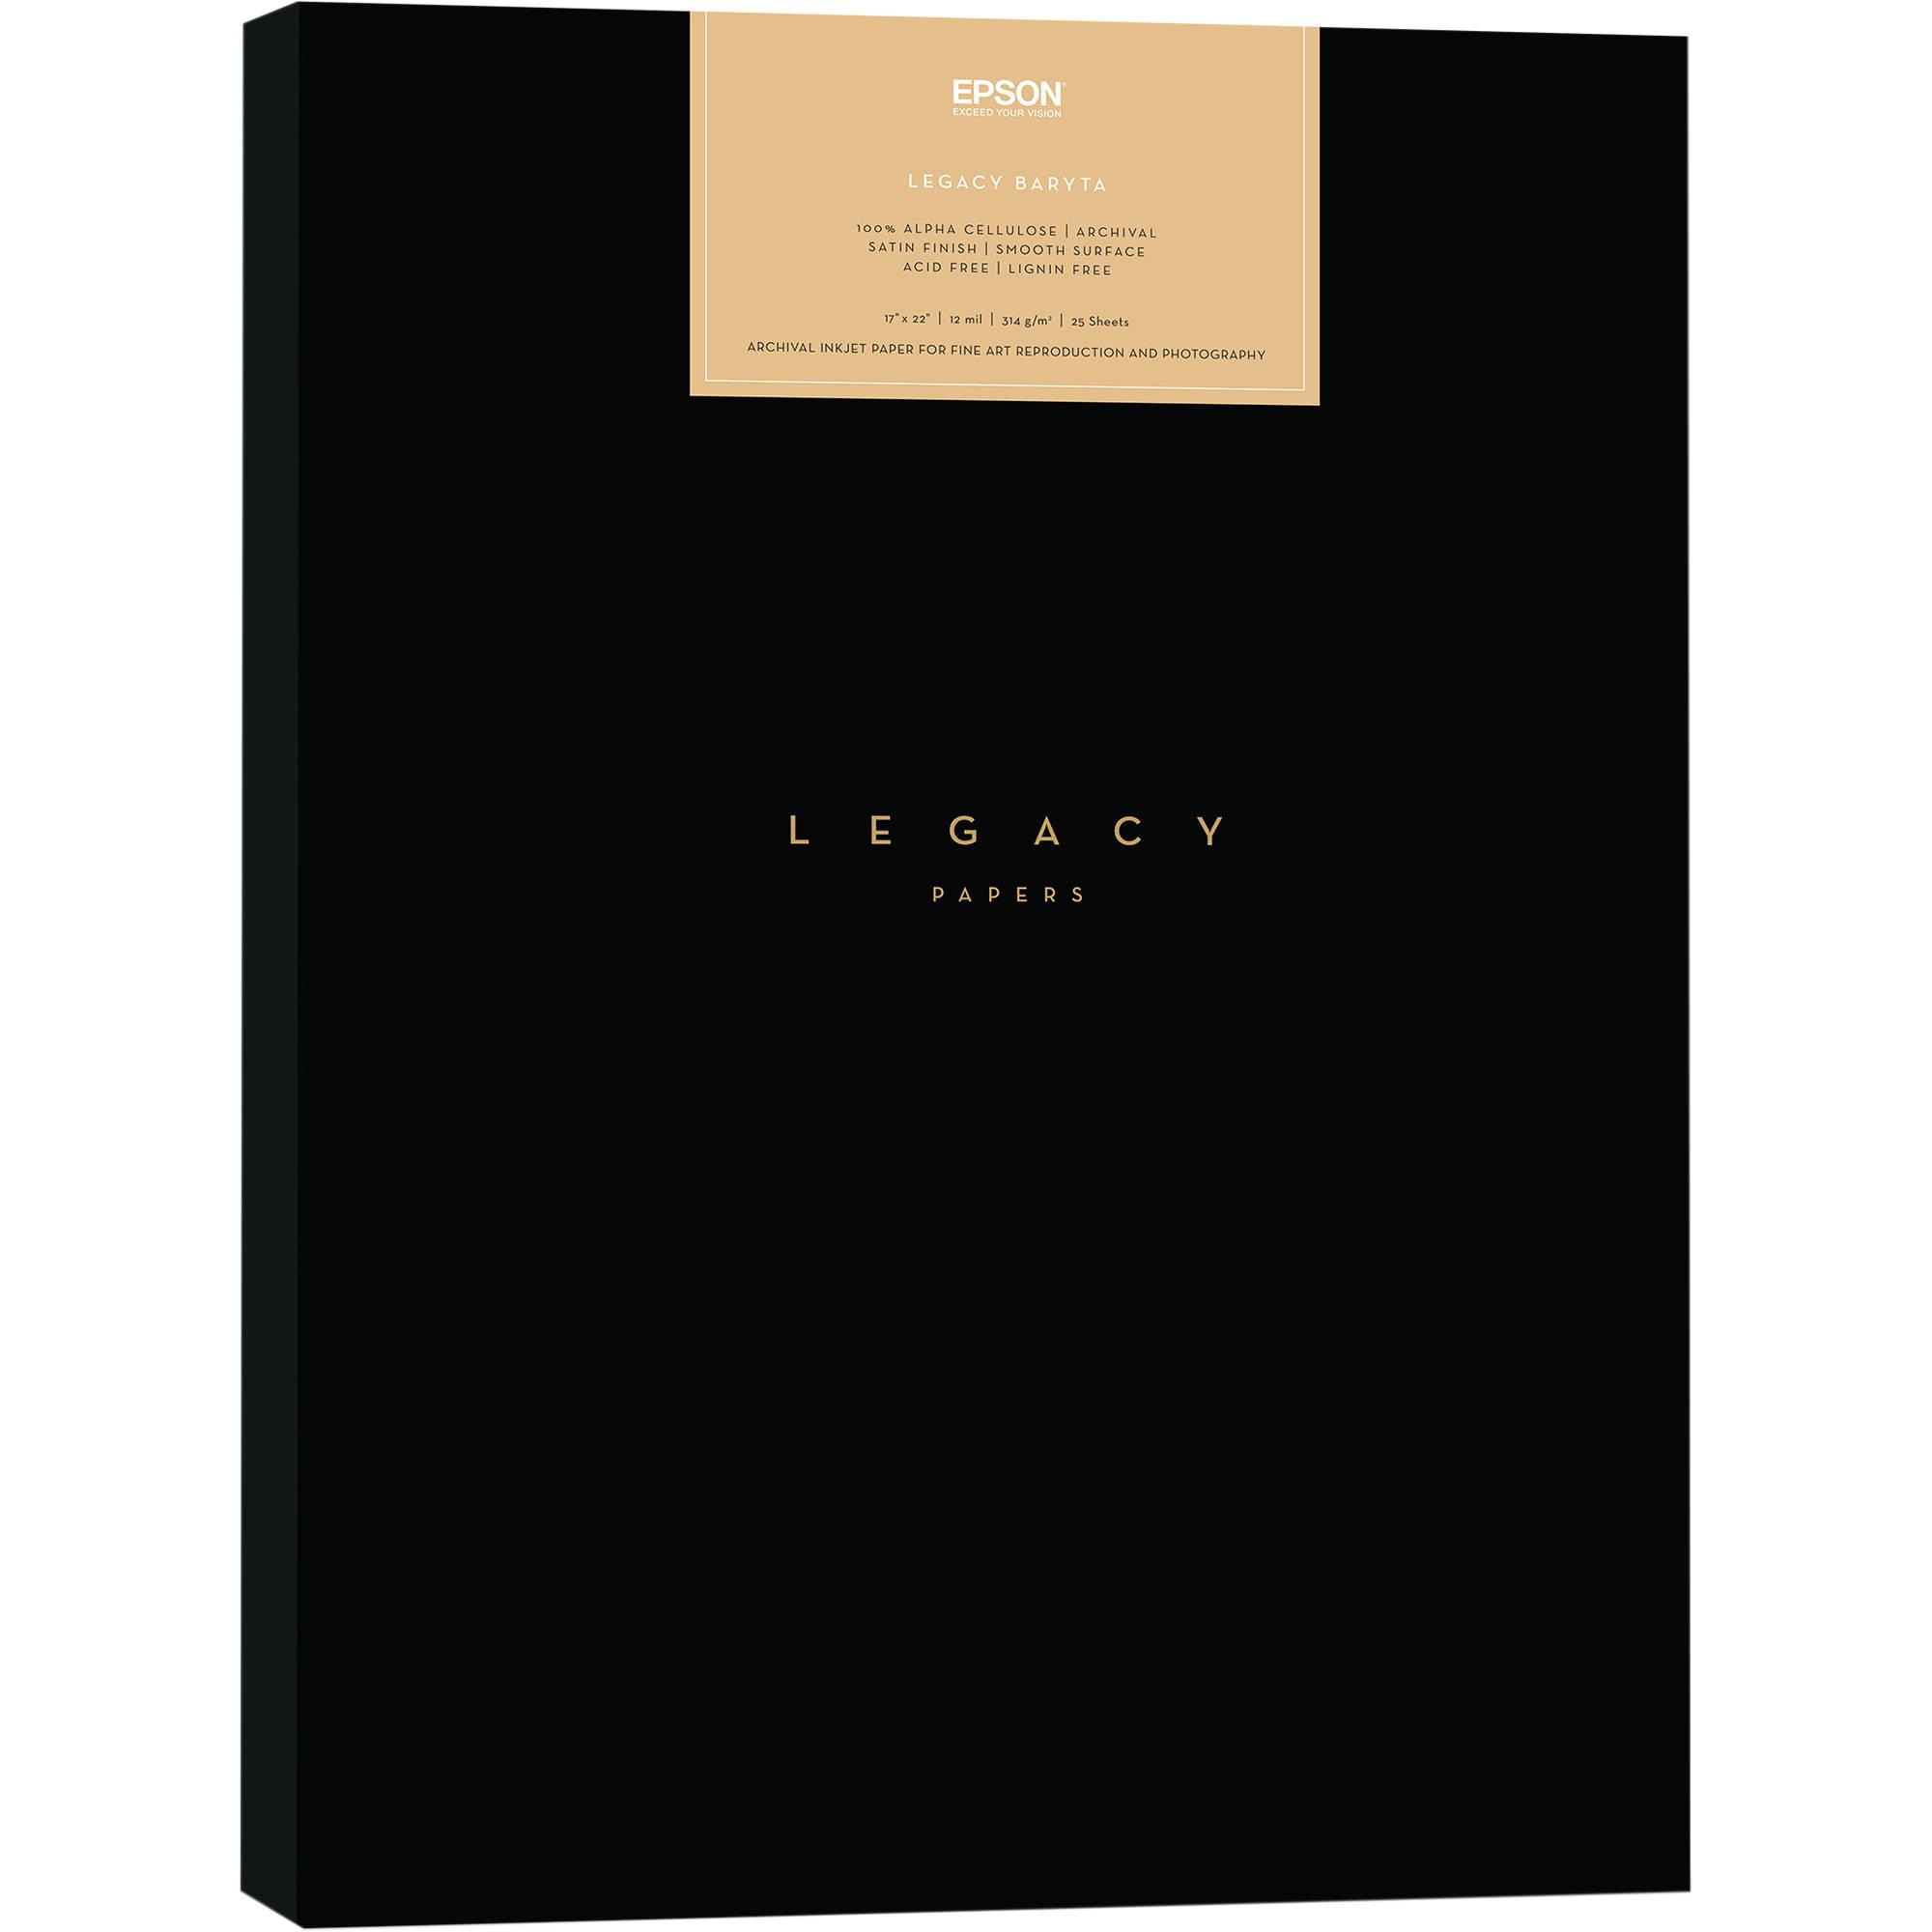 Epson Legacy Baryta Paper (17 x 22